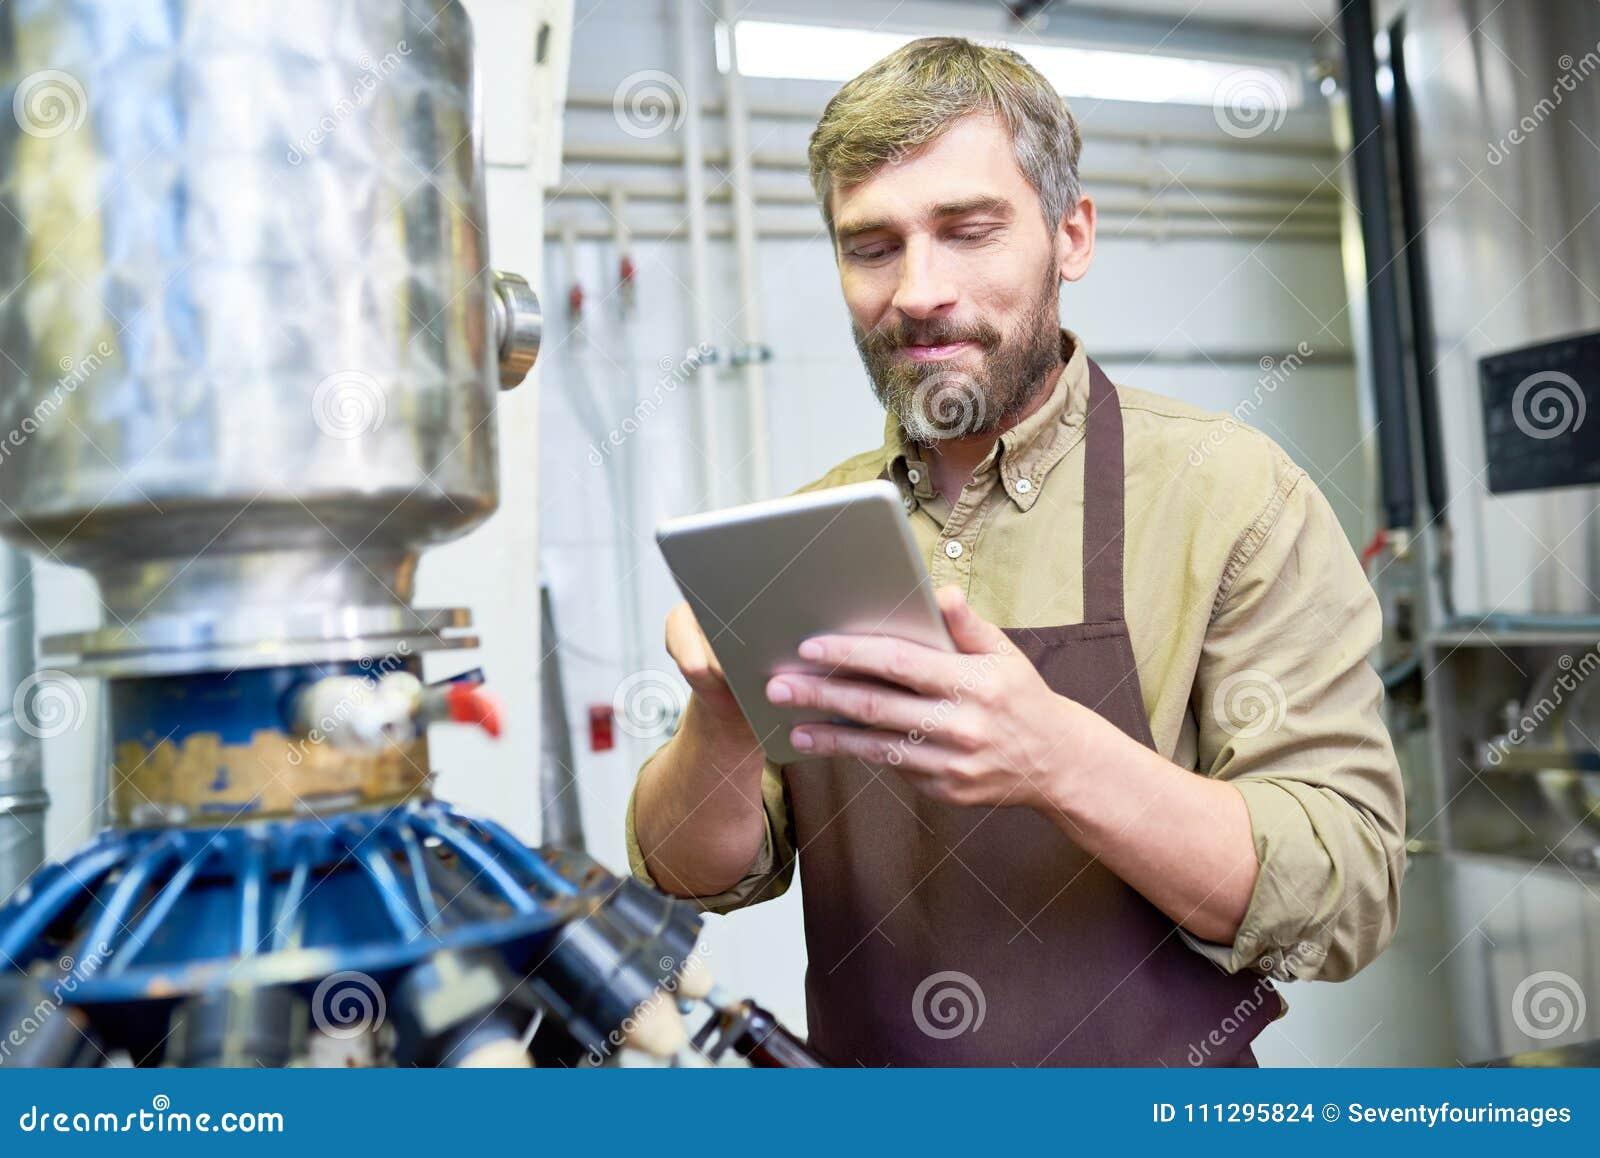 Handsome Brewer with Digital Tablet